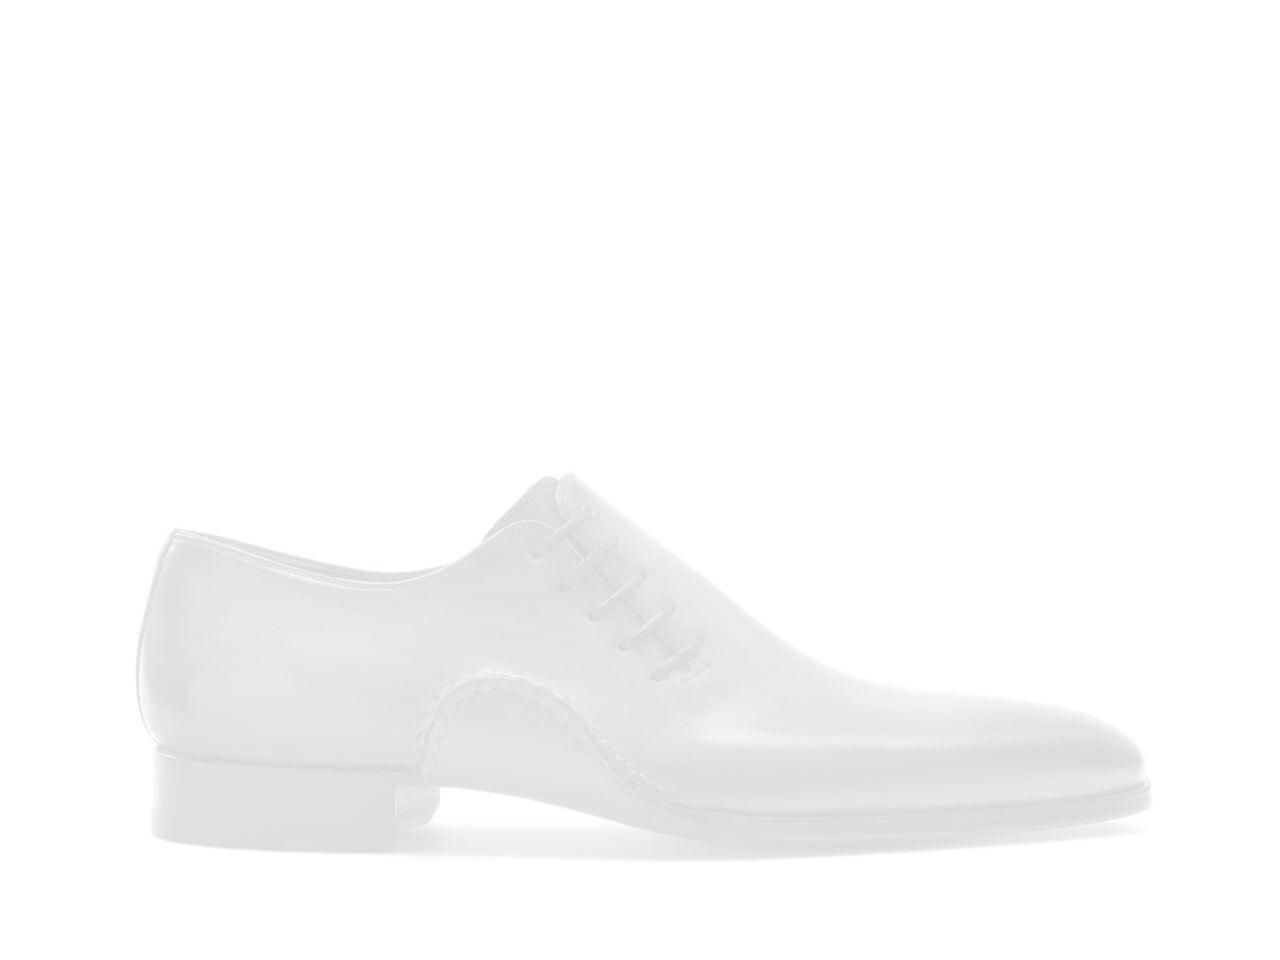 Side view of the Magnanni Cangas Cognac Men's Single Monk Strap Shoes